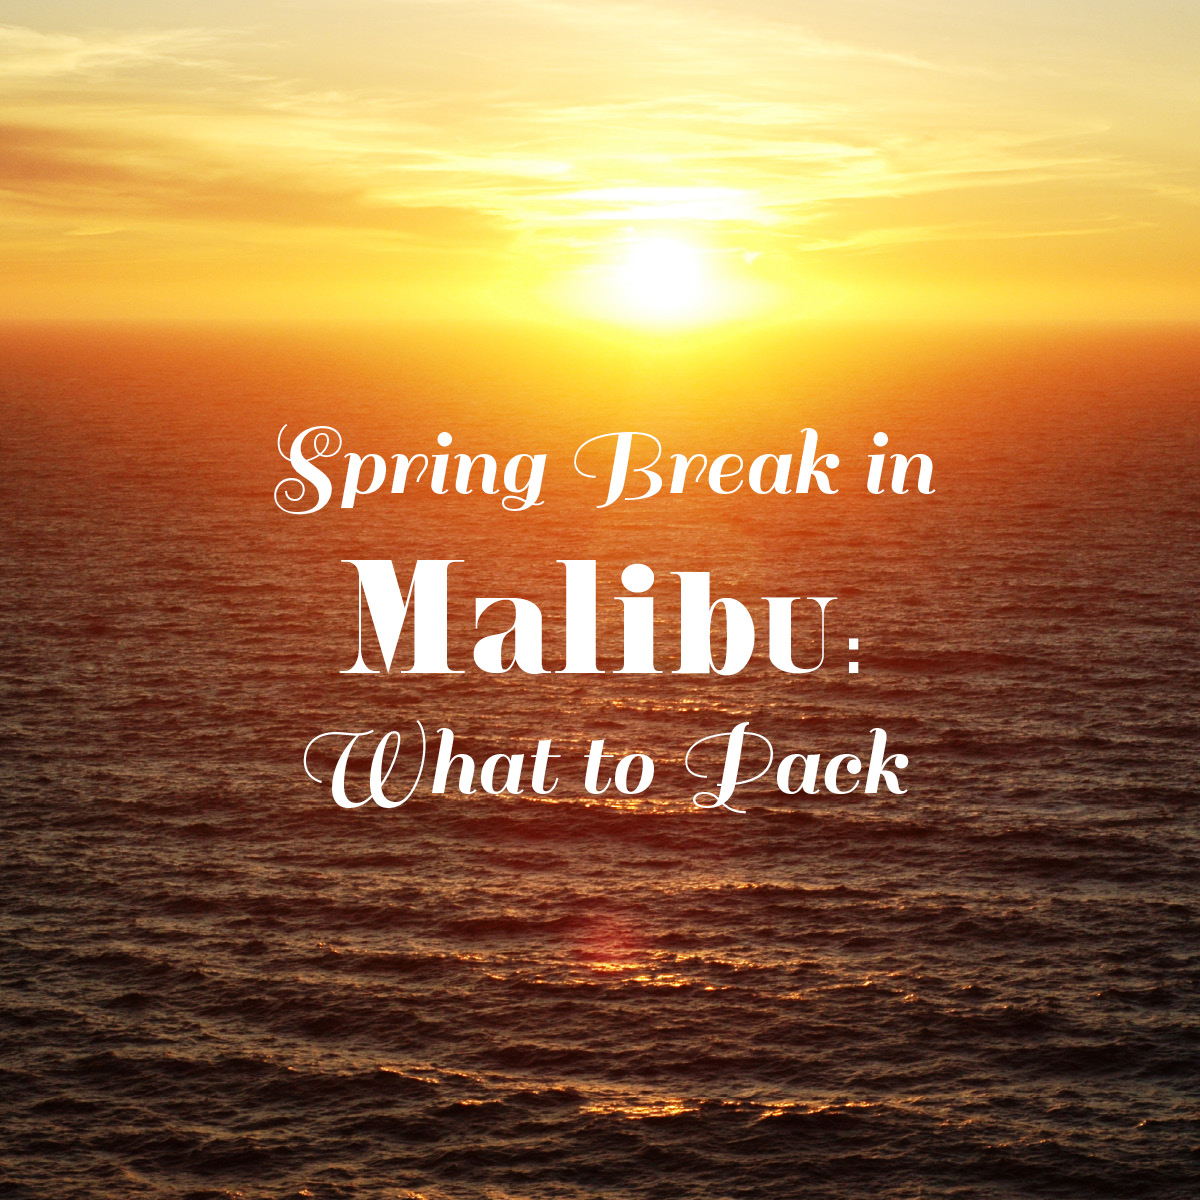 Spring Break in Malibu on A Few of My Favorite Things